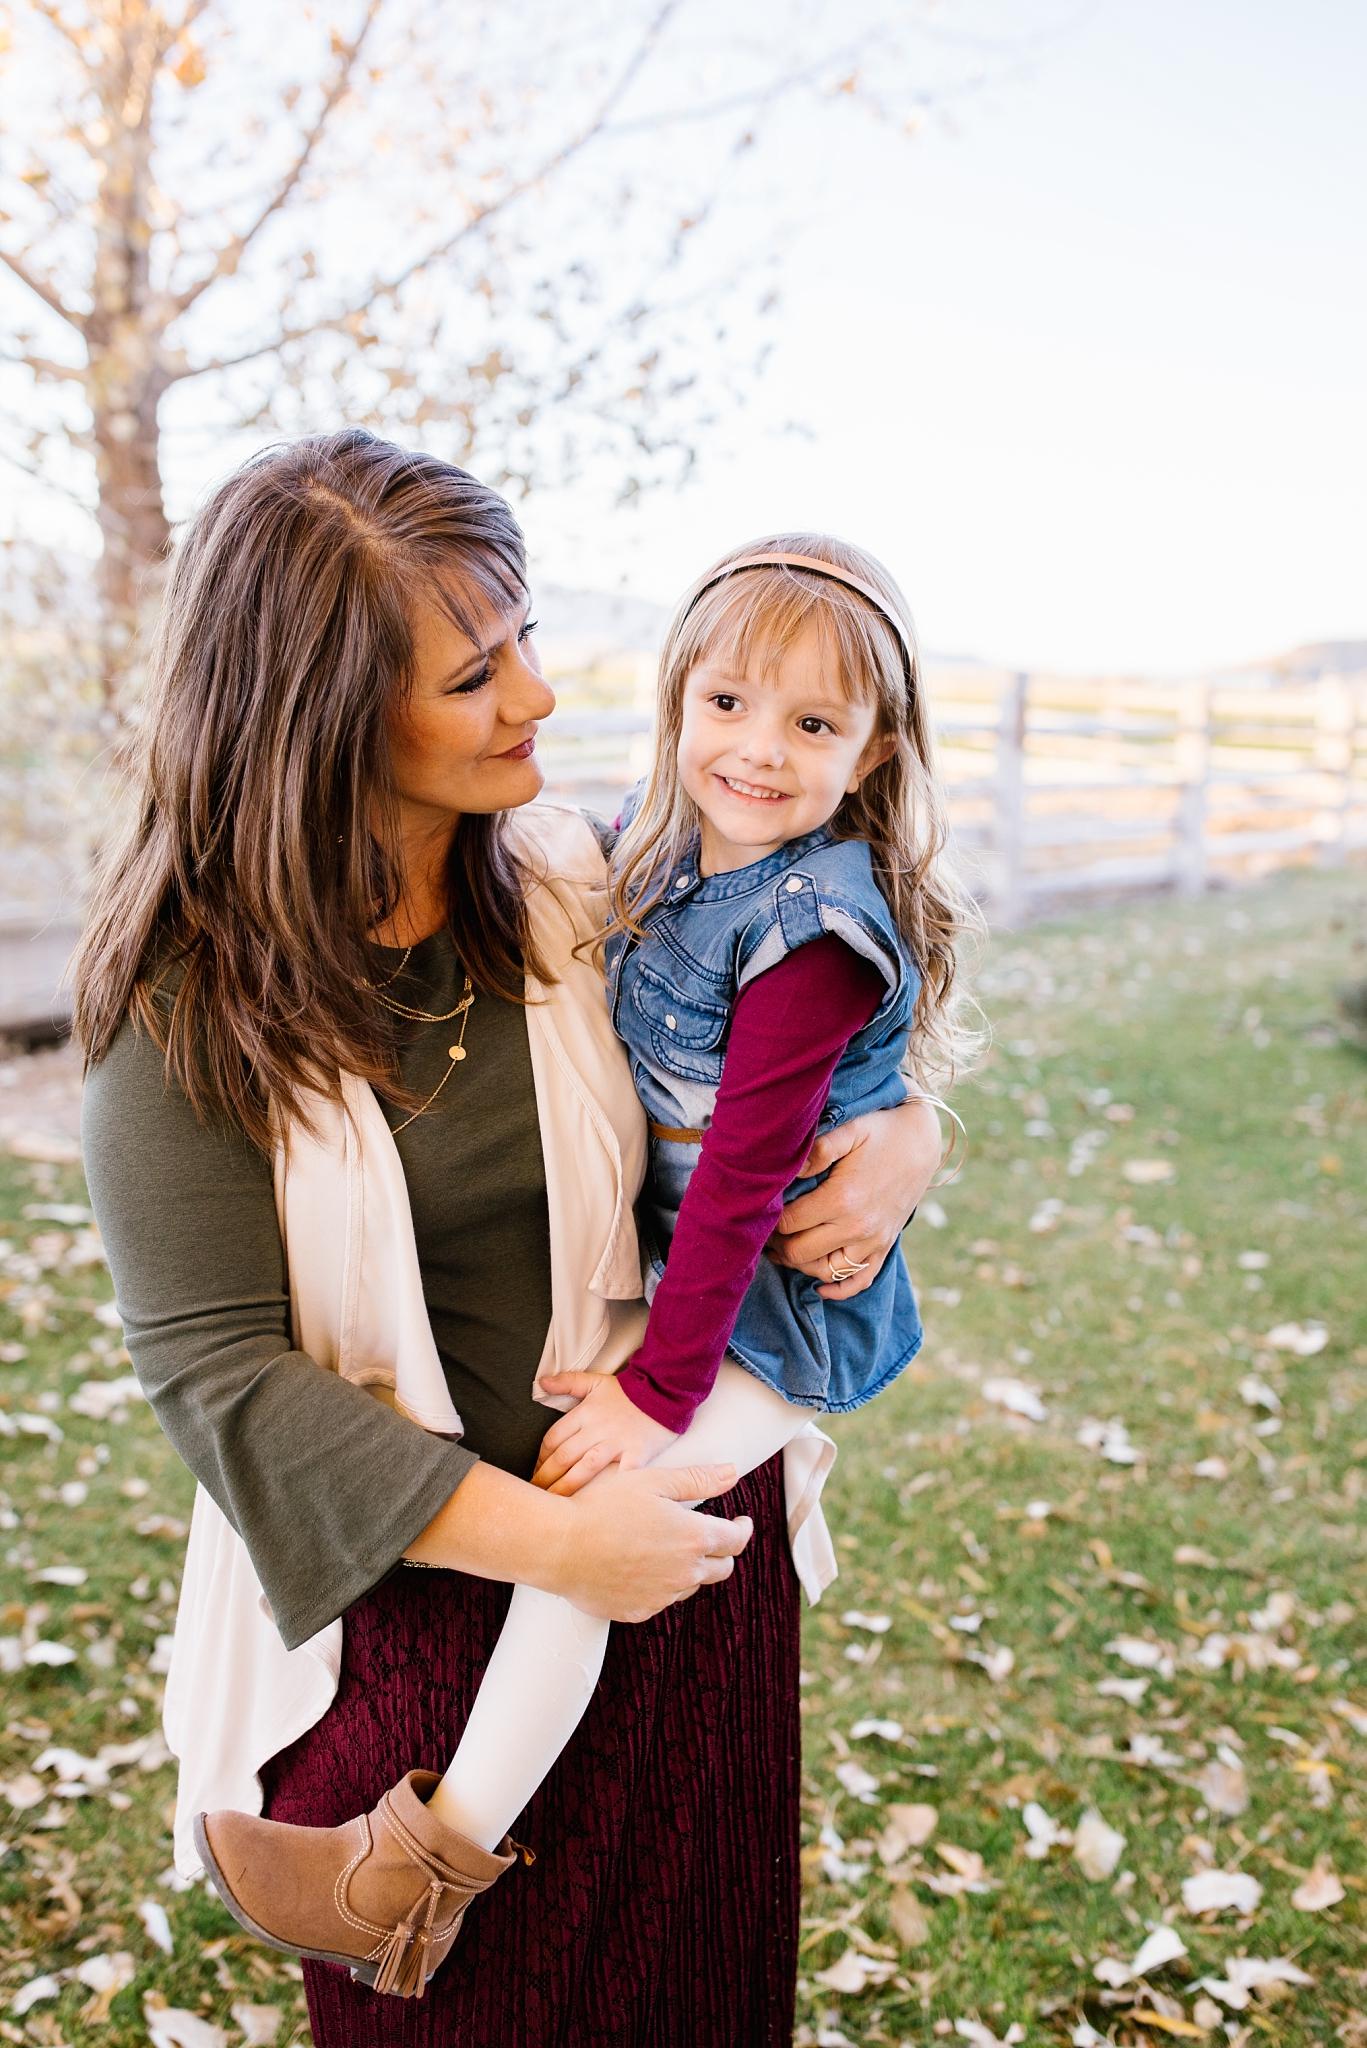 Mickelsen-43_Lizzie-B-Imagery-Utah-Family-Photographer-Lifestyle-Photography-Salt-Lake-City-Park-City-Utah-County.jpg